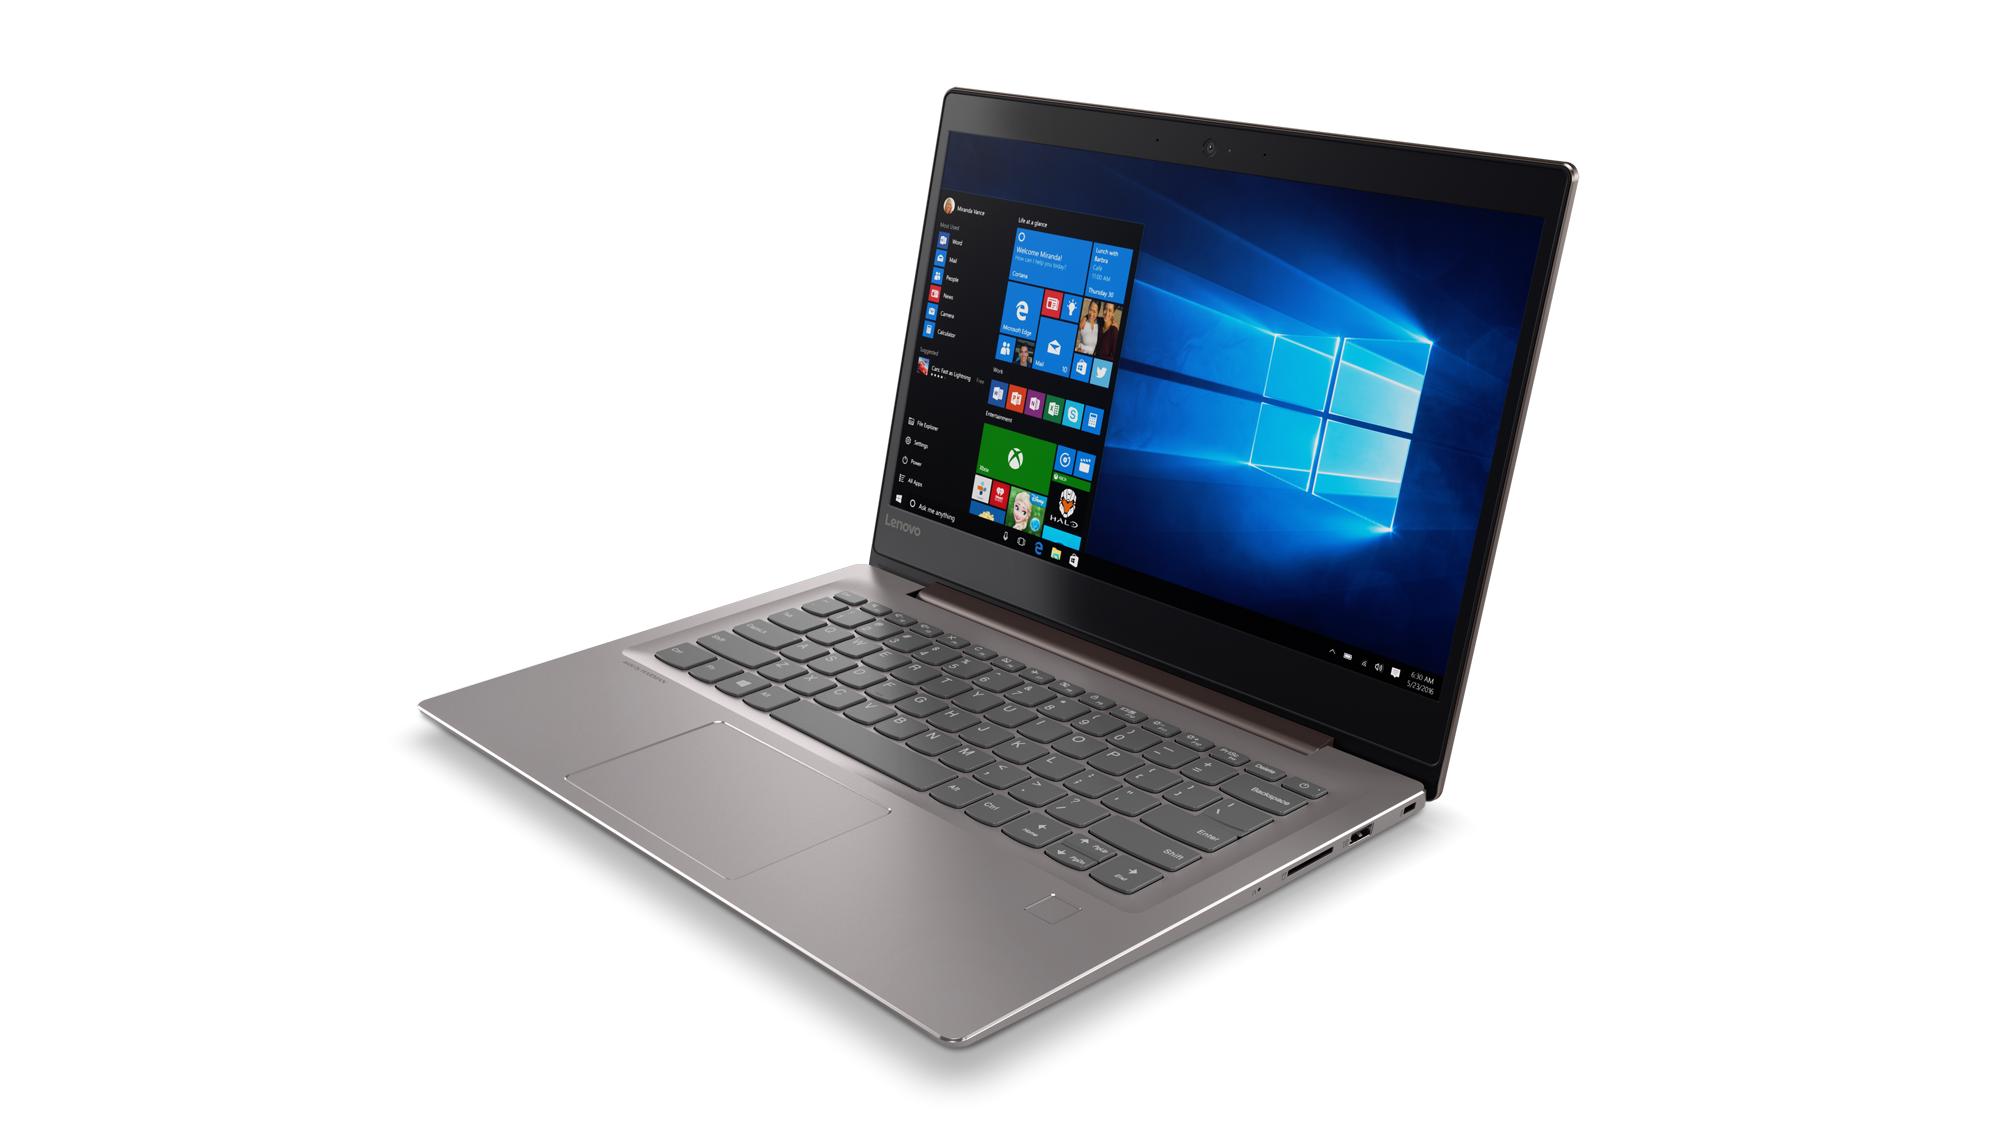 "Lenovo IdeaPad 520S-14IKBR i5-8250U 3,40GHz/8GB/SSD 128GB+HDD 1TB/14"" FHD/IPS/AG/GeForce 2GB/WIN10 bronzová"